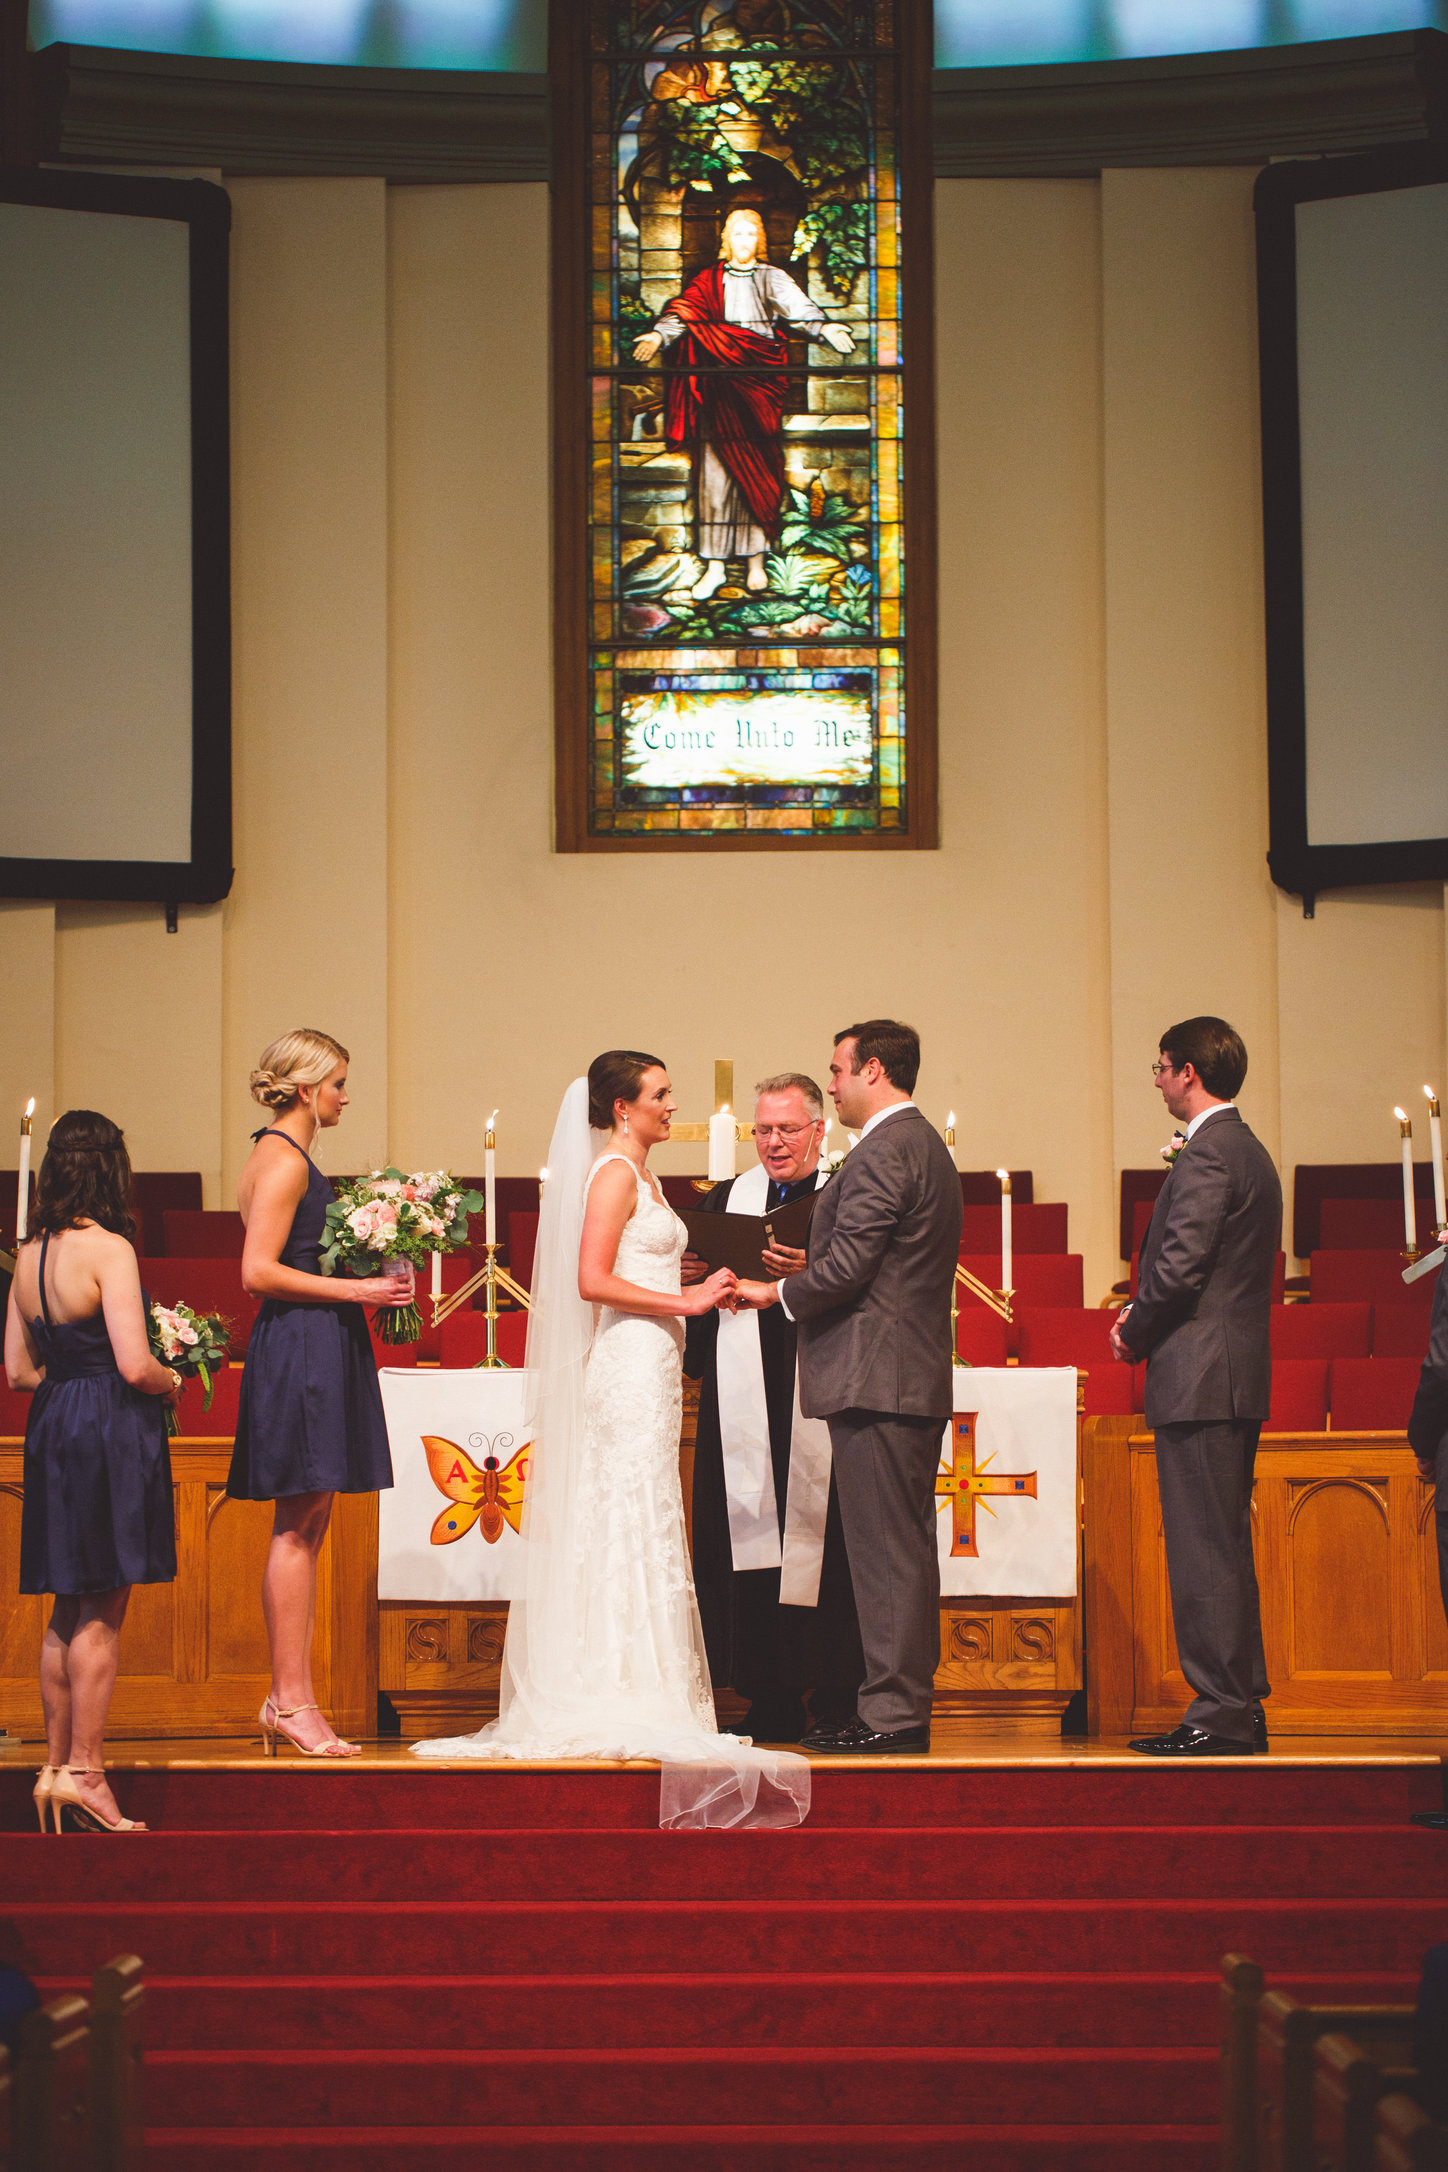 SandC-wedding-216.jpg